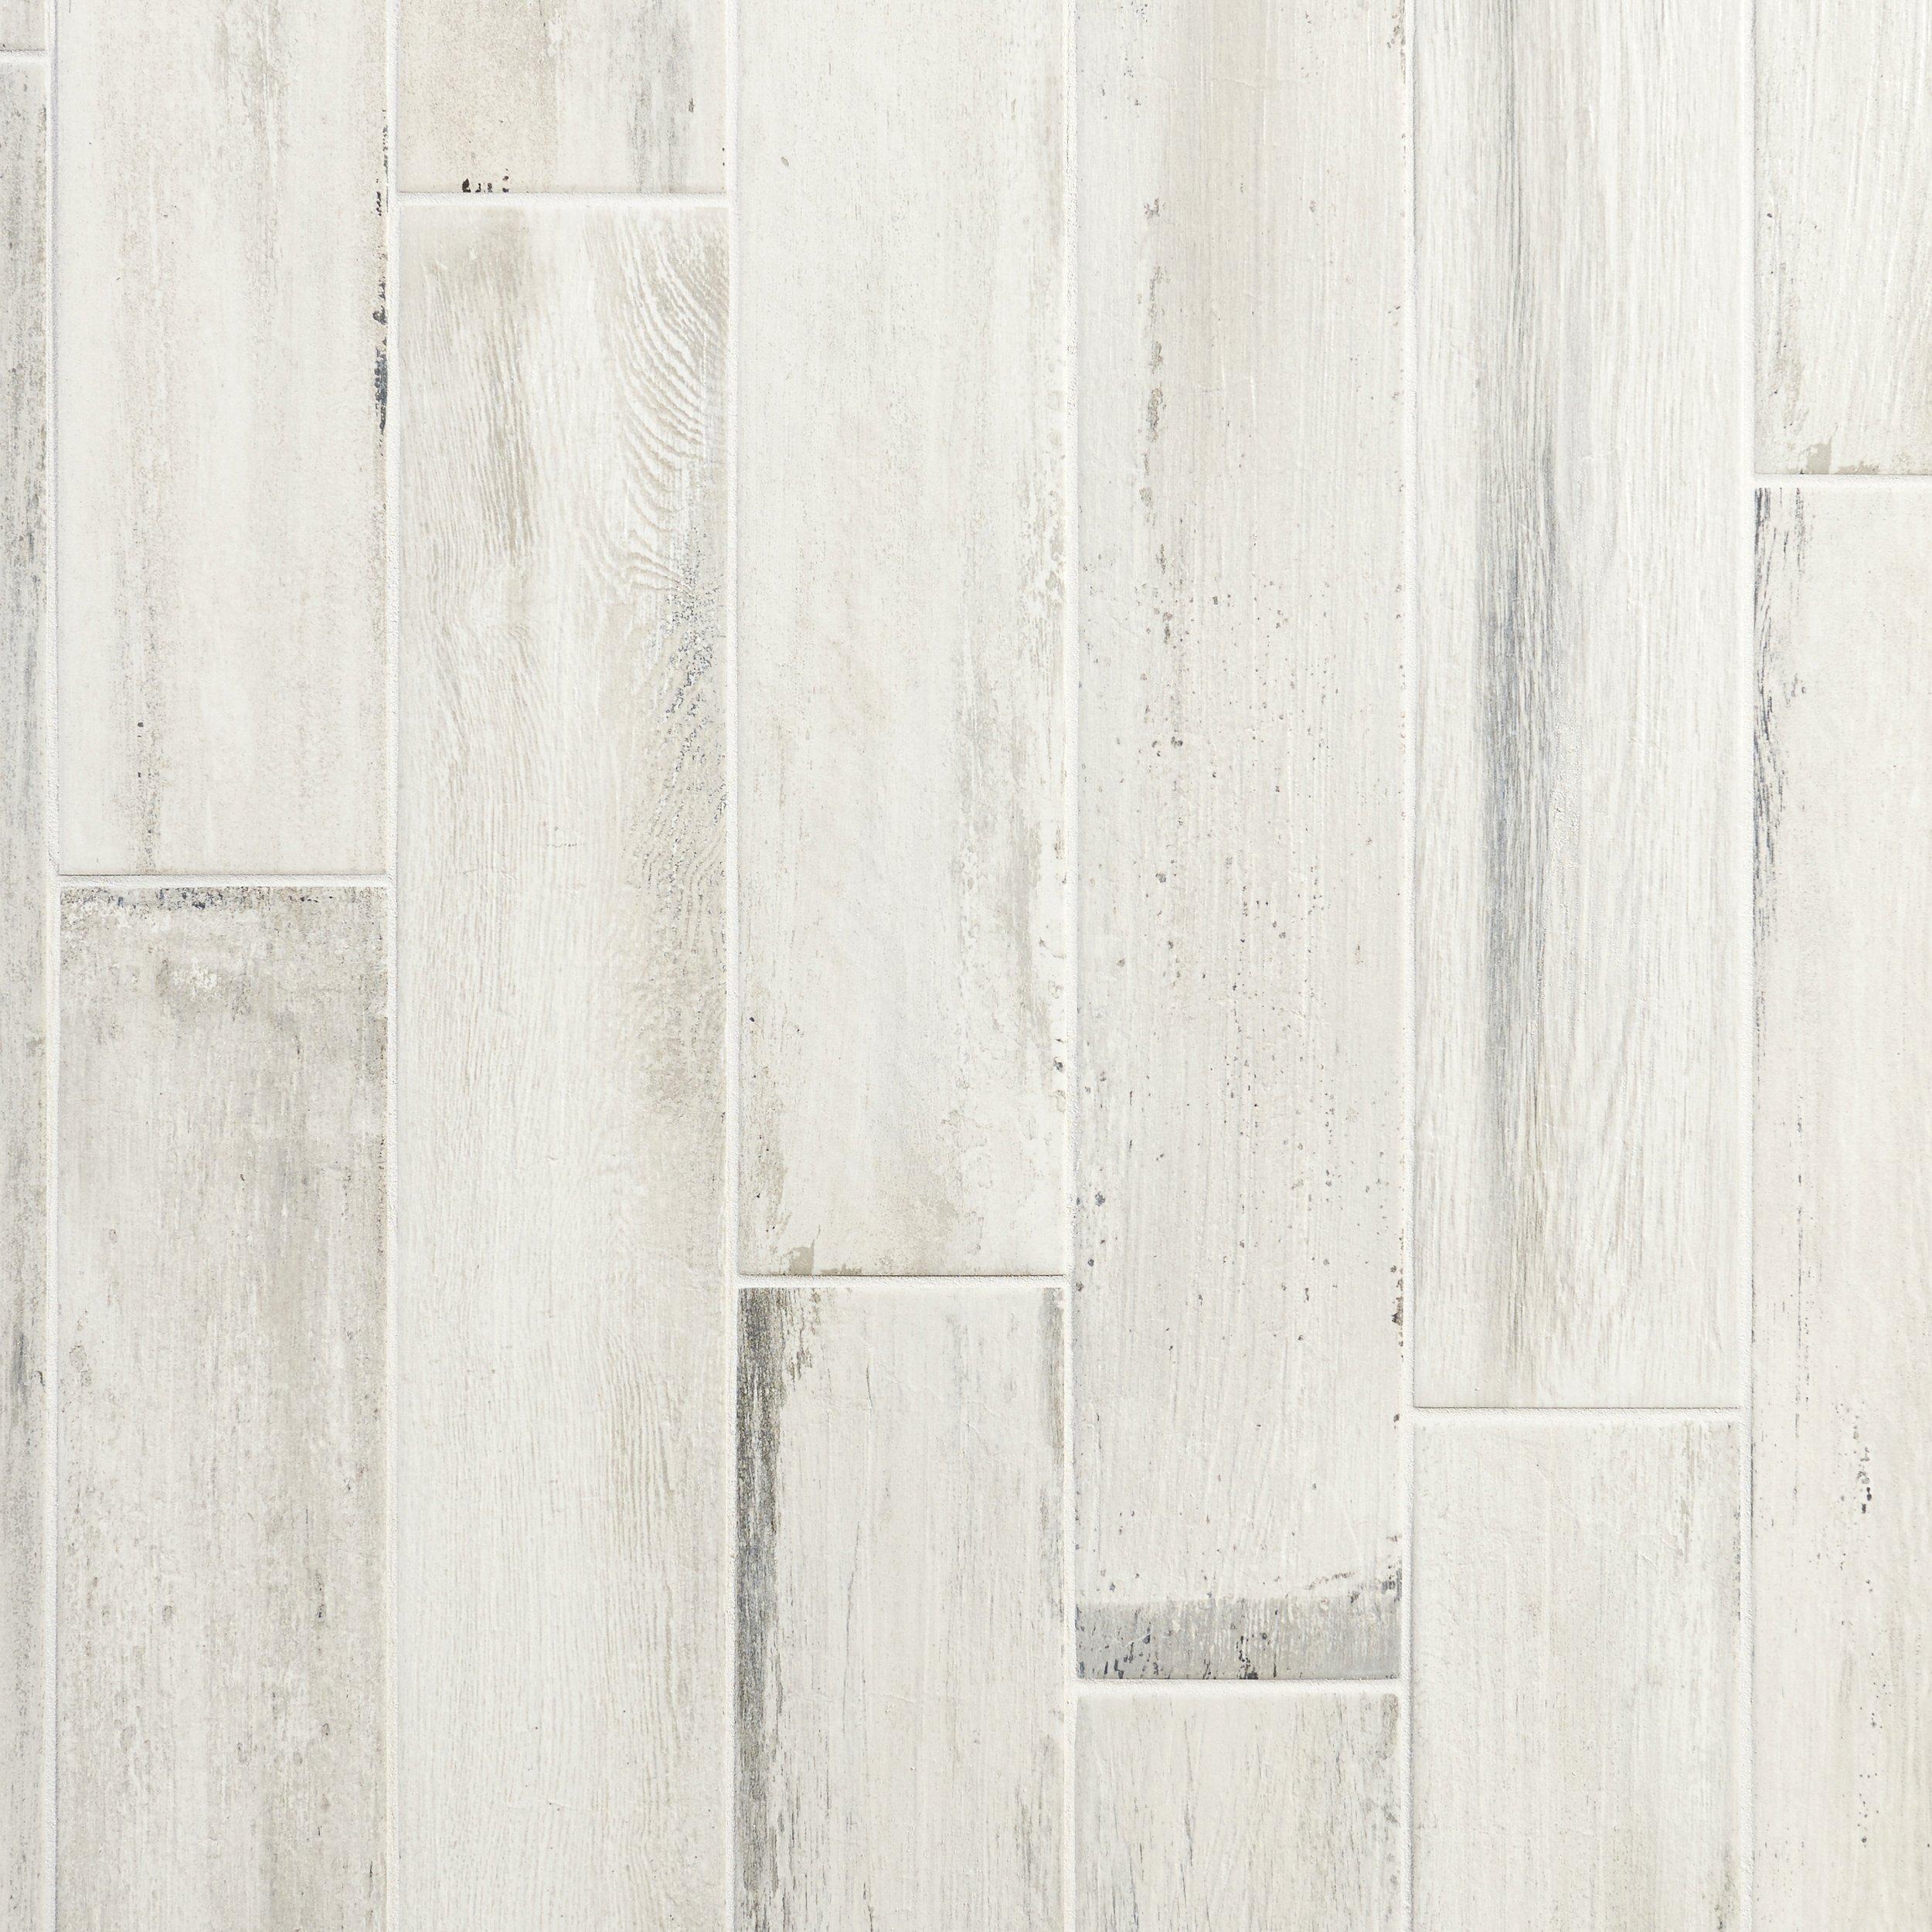 ashford lexington white wood plank porcelain tile